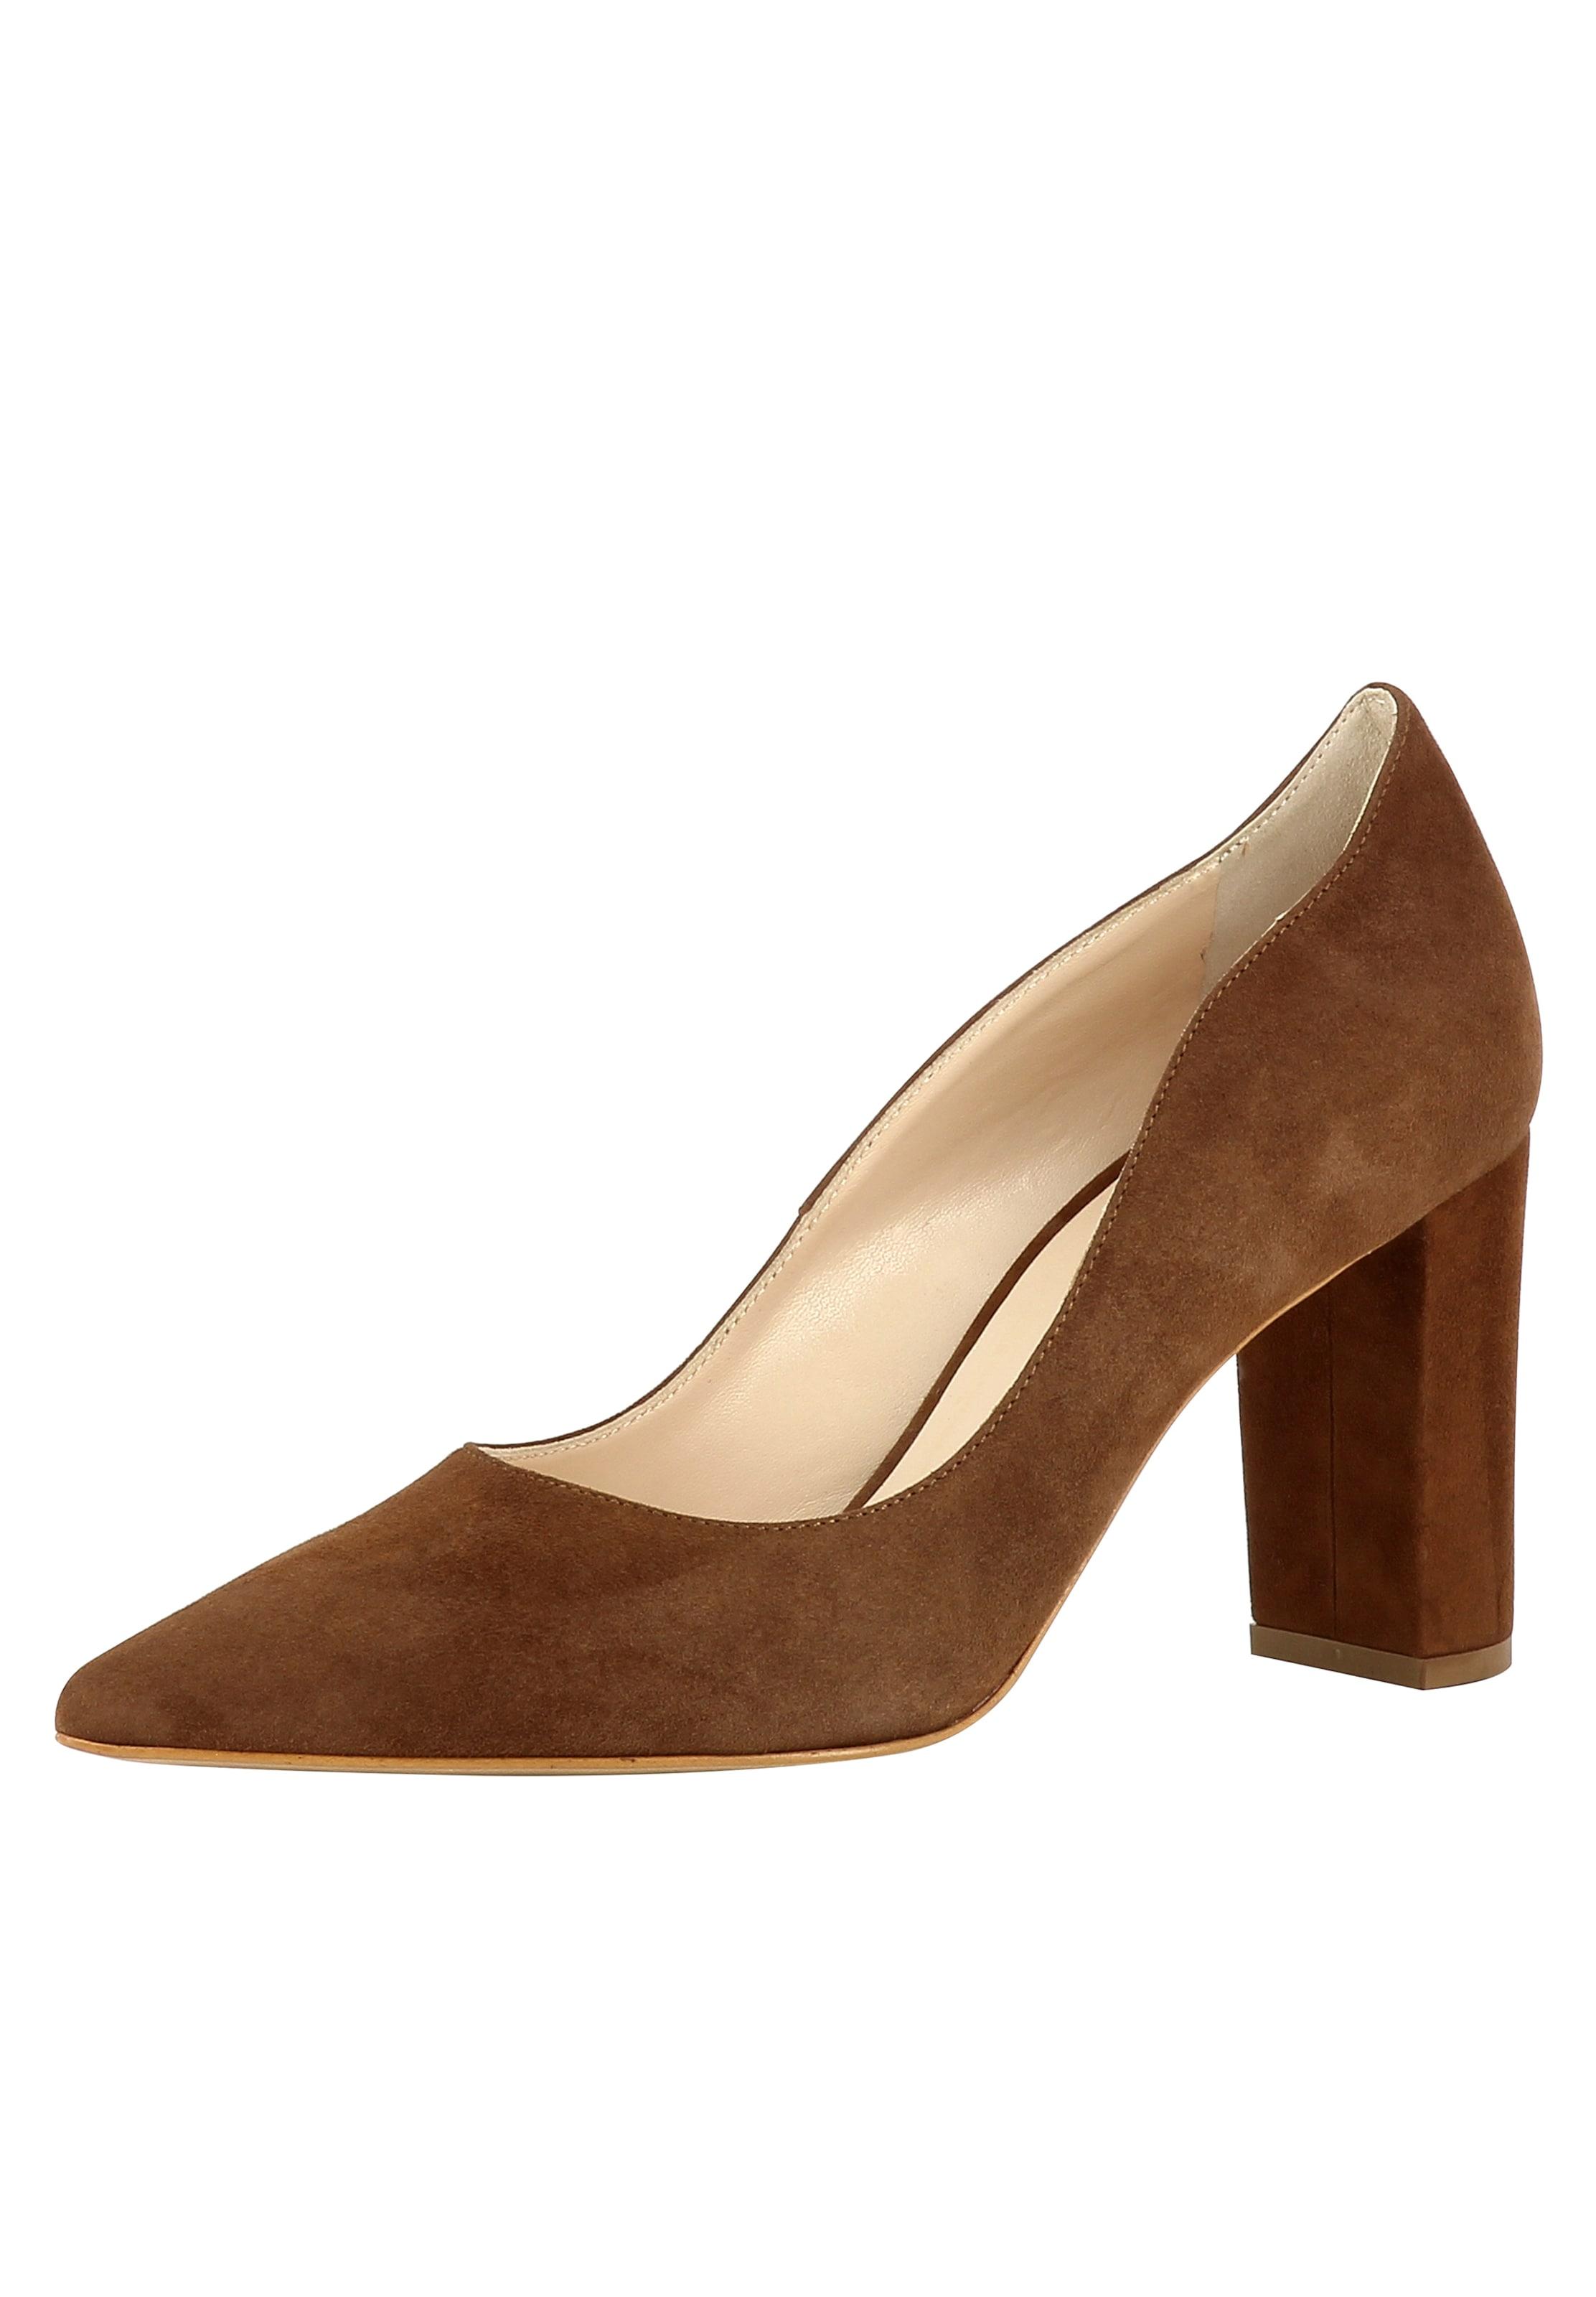 Haltbare 'JESSICA' Mode billige Schuhe EVITA | Damen Pumps 'JESSICA' Haltbare Schuhe Gut getragene Schuhe cccc7c